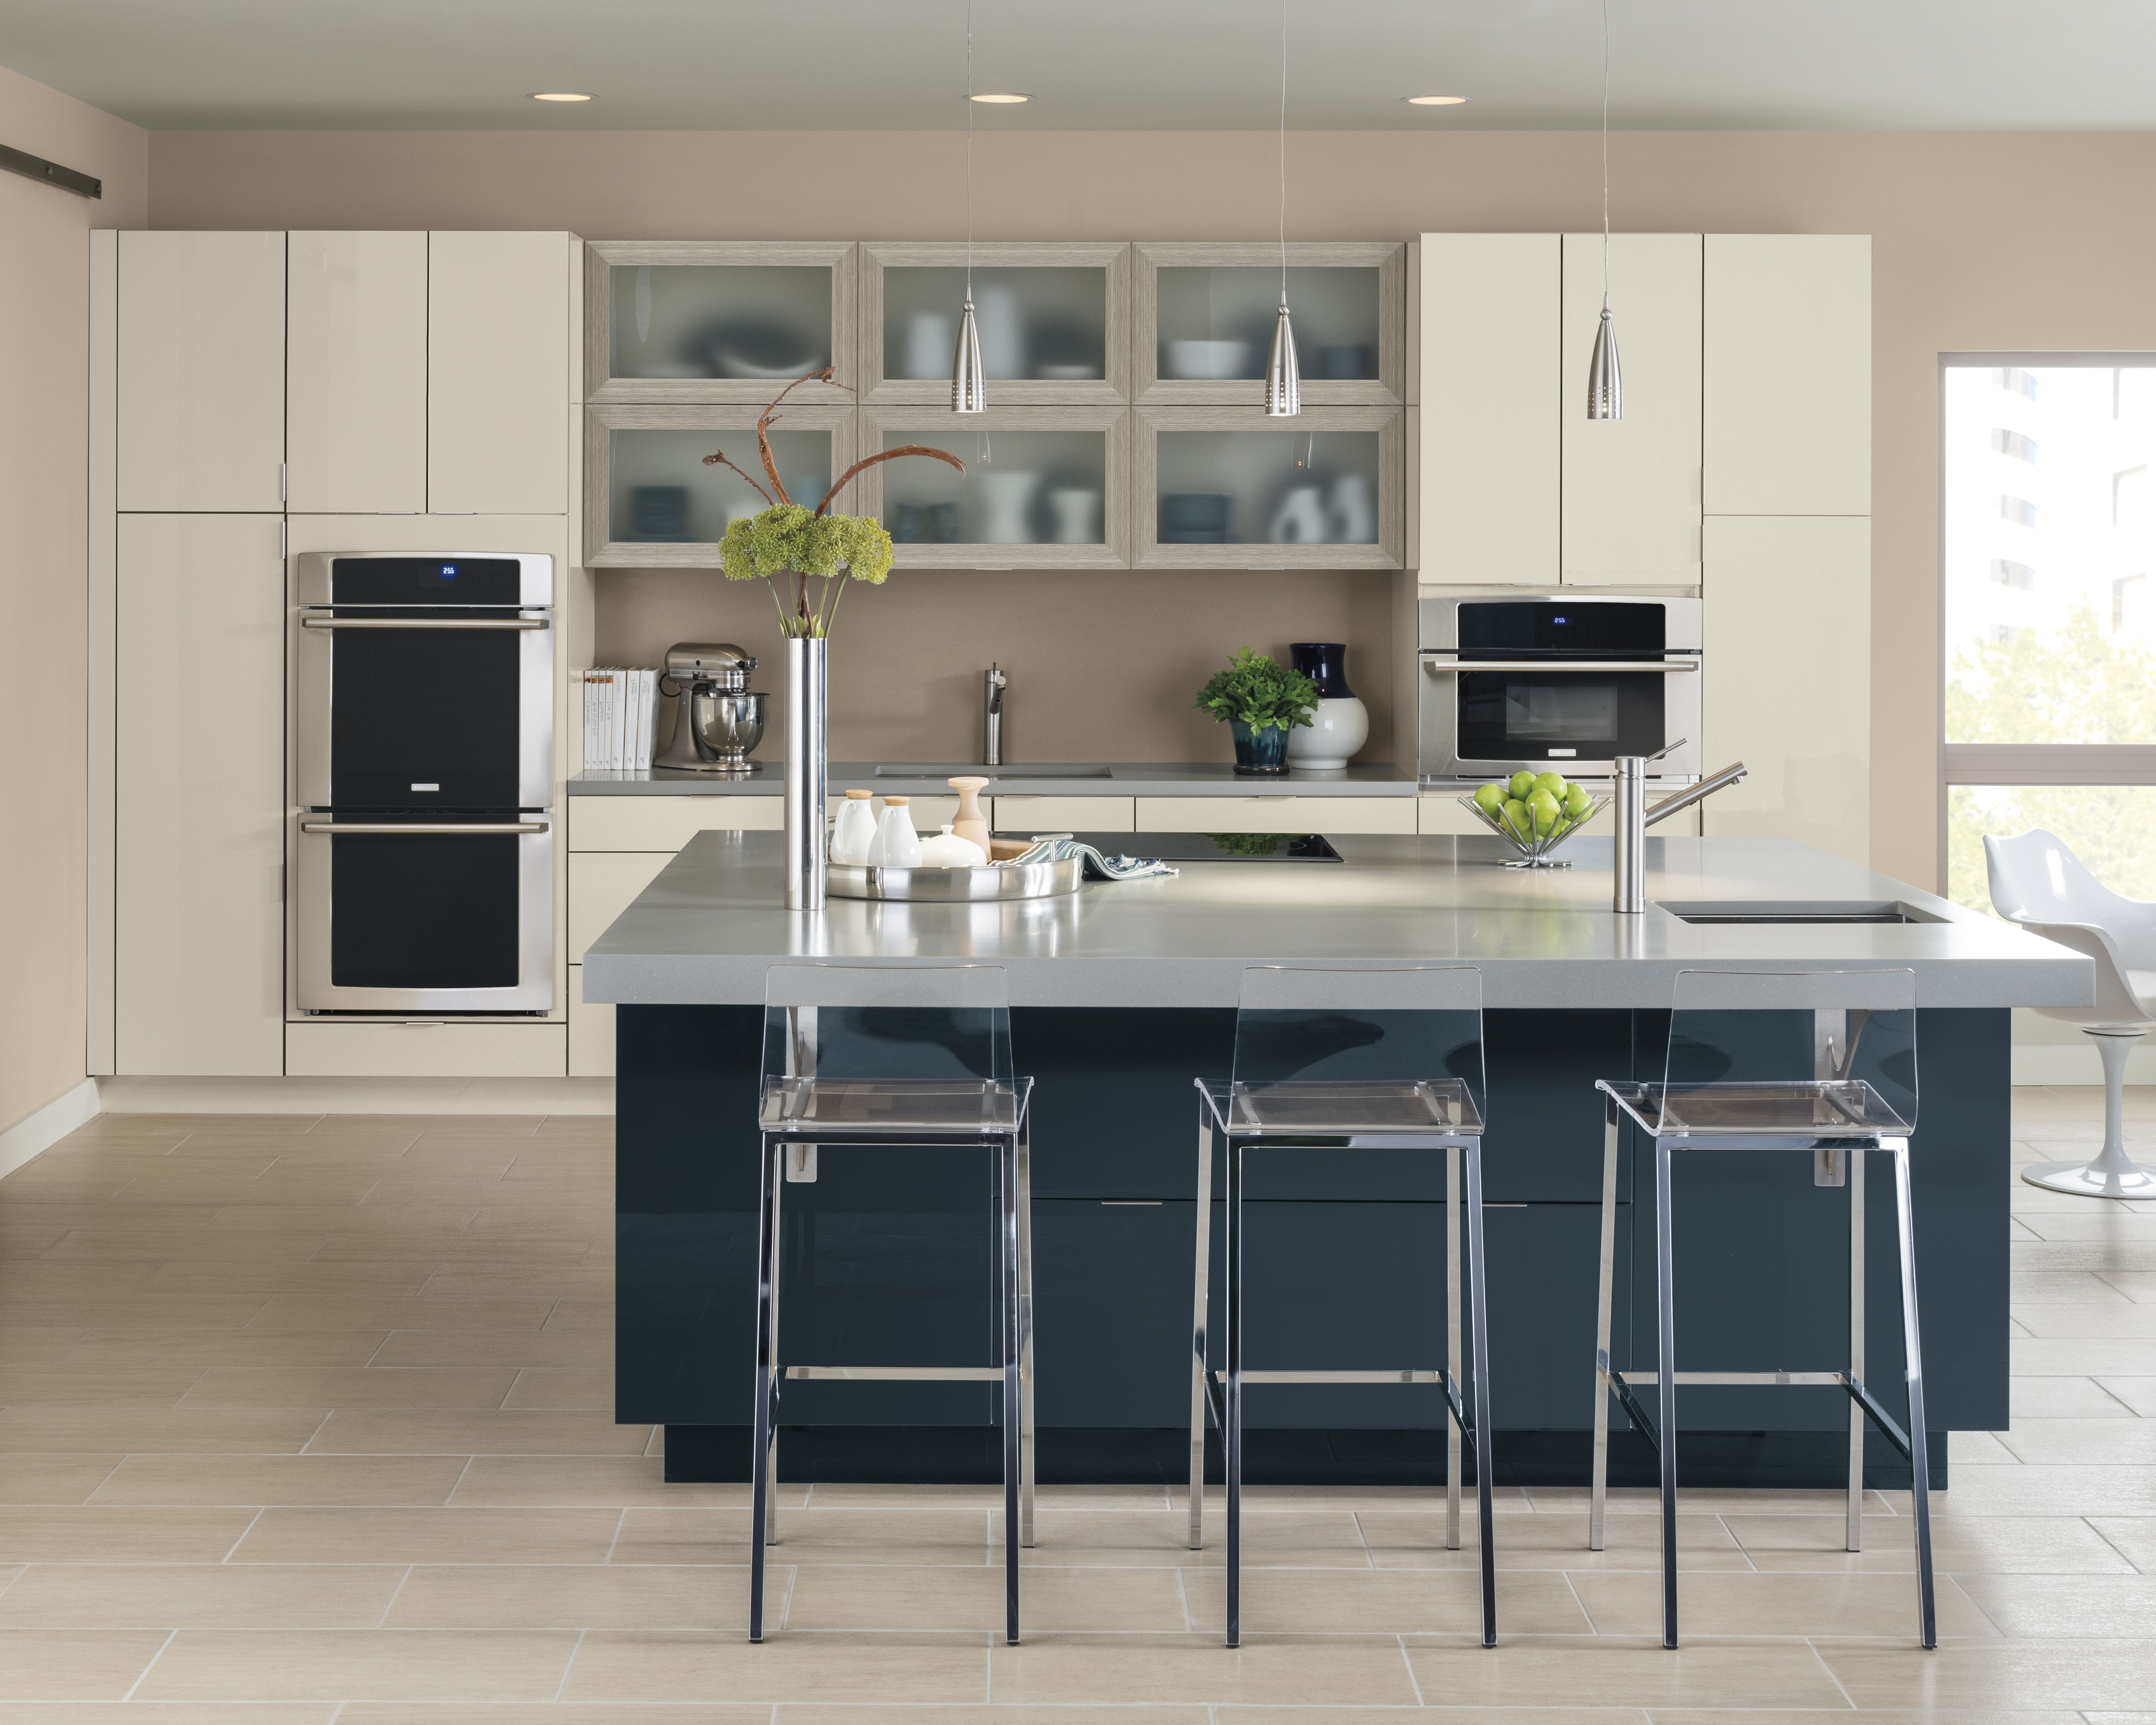 Diamond Kitchen Cabinets Open Plan Kitchen Living Room Kitchen Cabinet Styles Outdoor Kitchen Cabinets